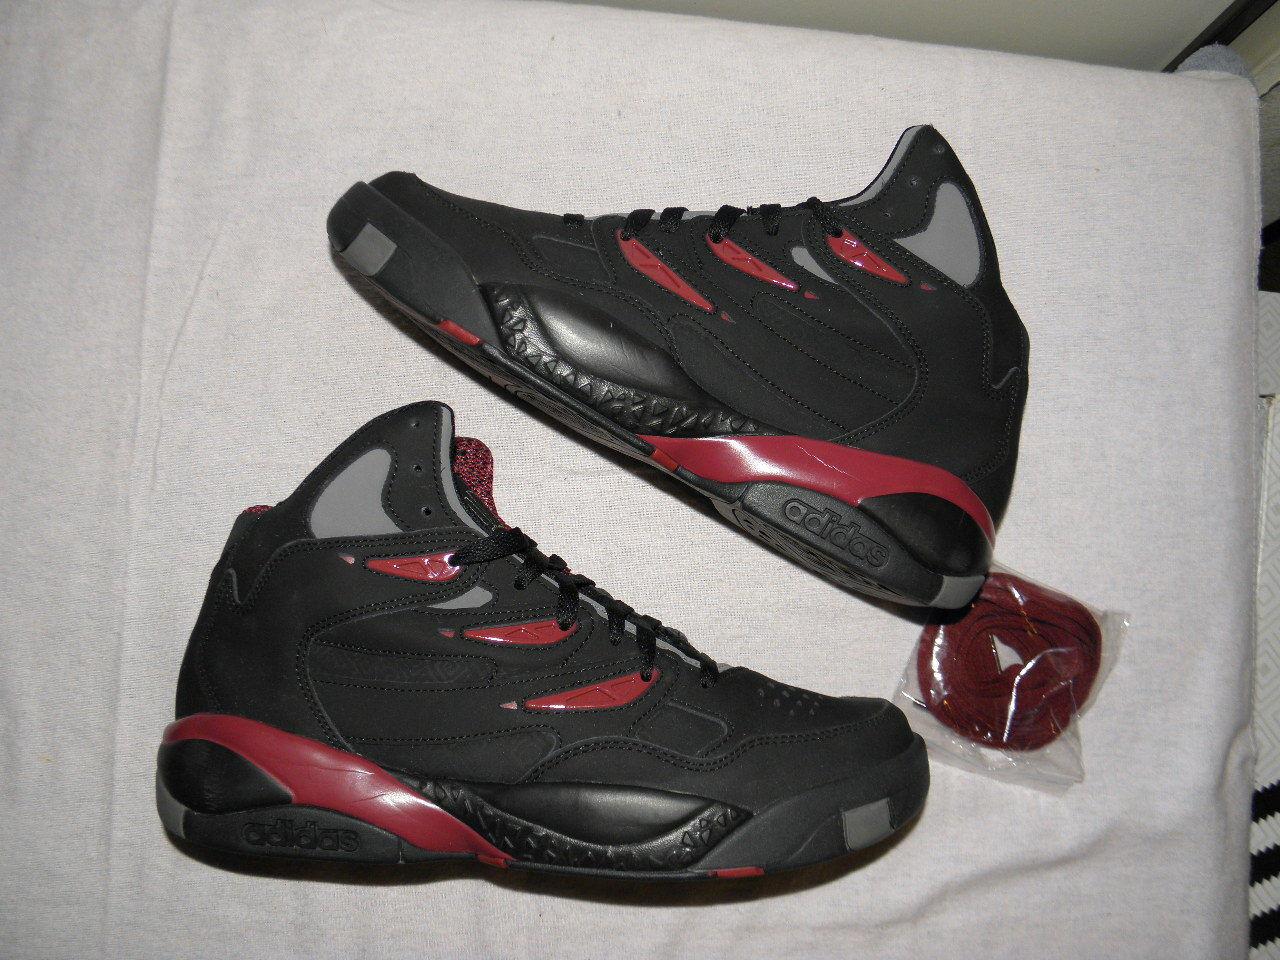 Adidas Dikembe Mutombo 2 II Two Deke yeezy boost Originals size 11 EUC black red